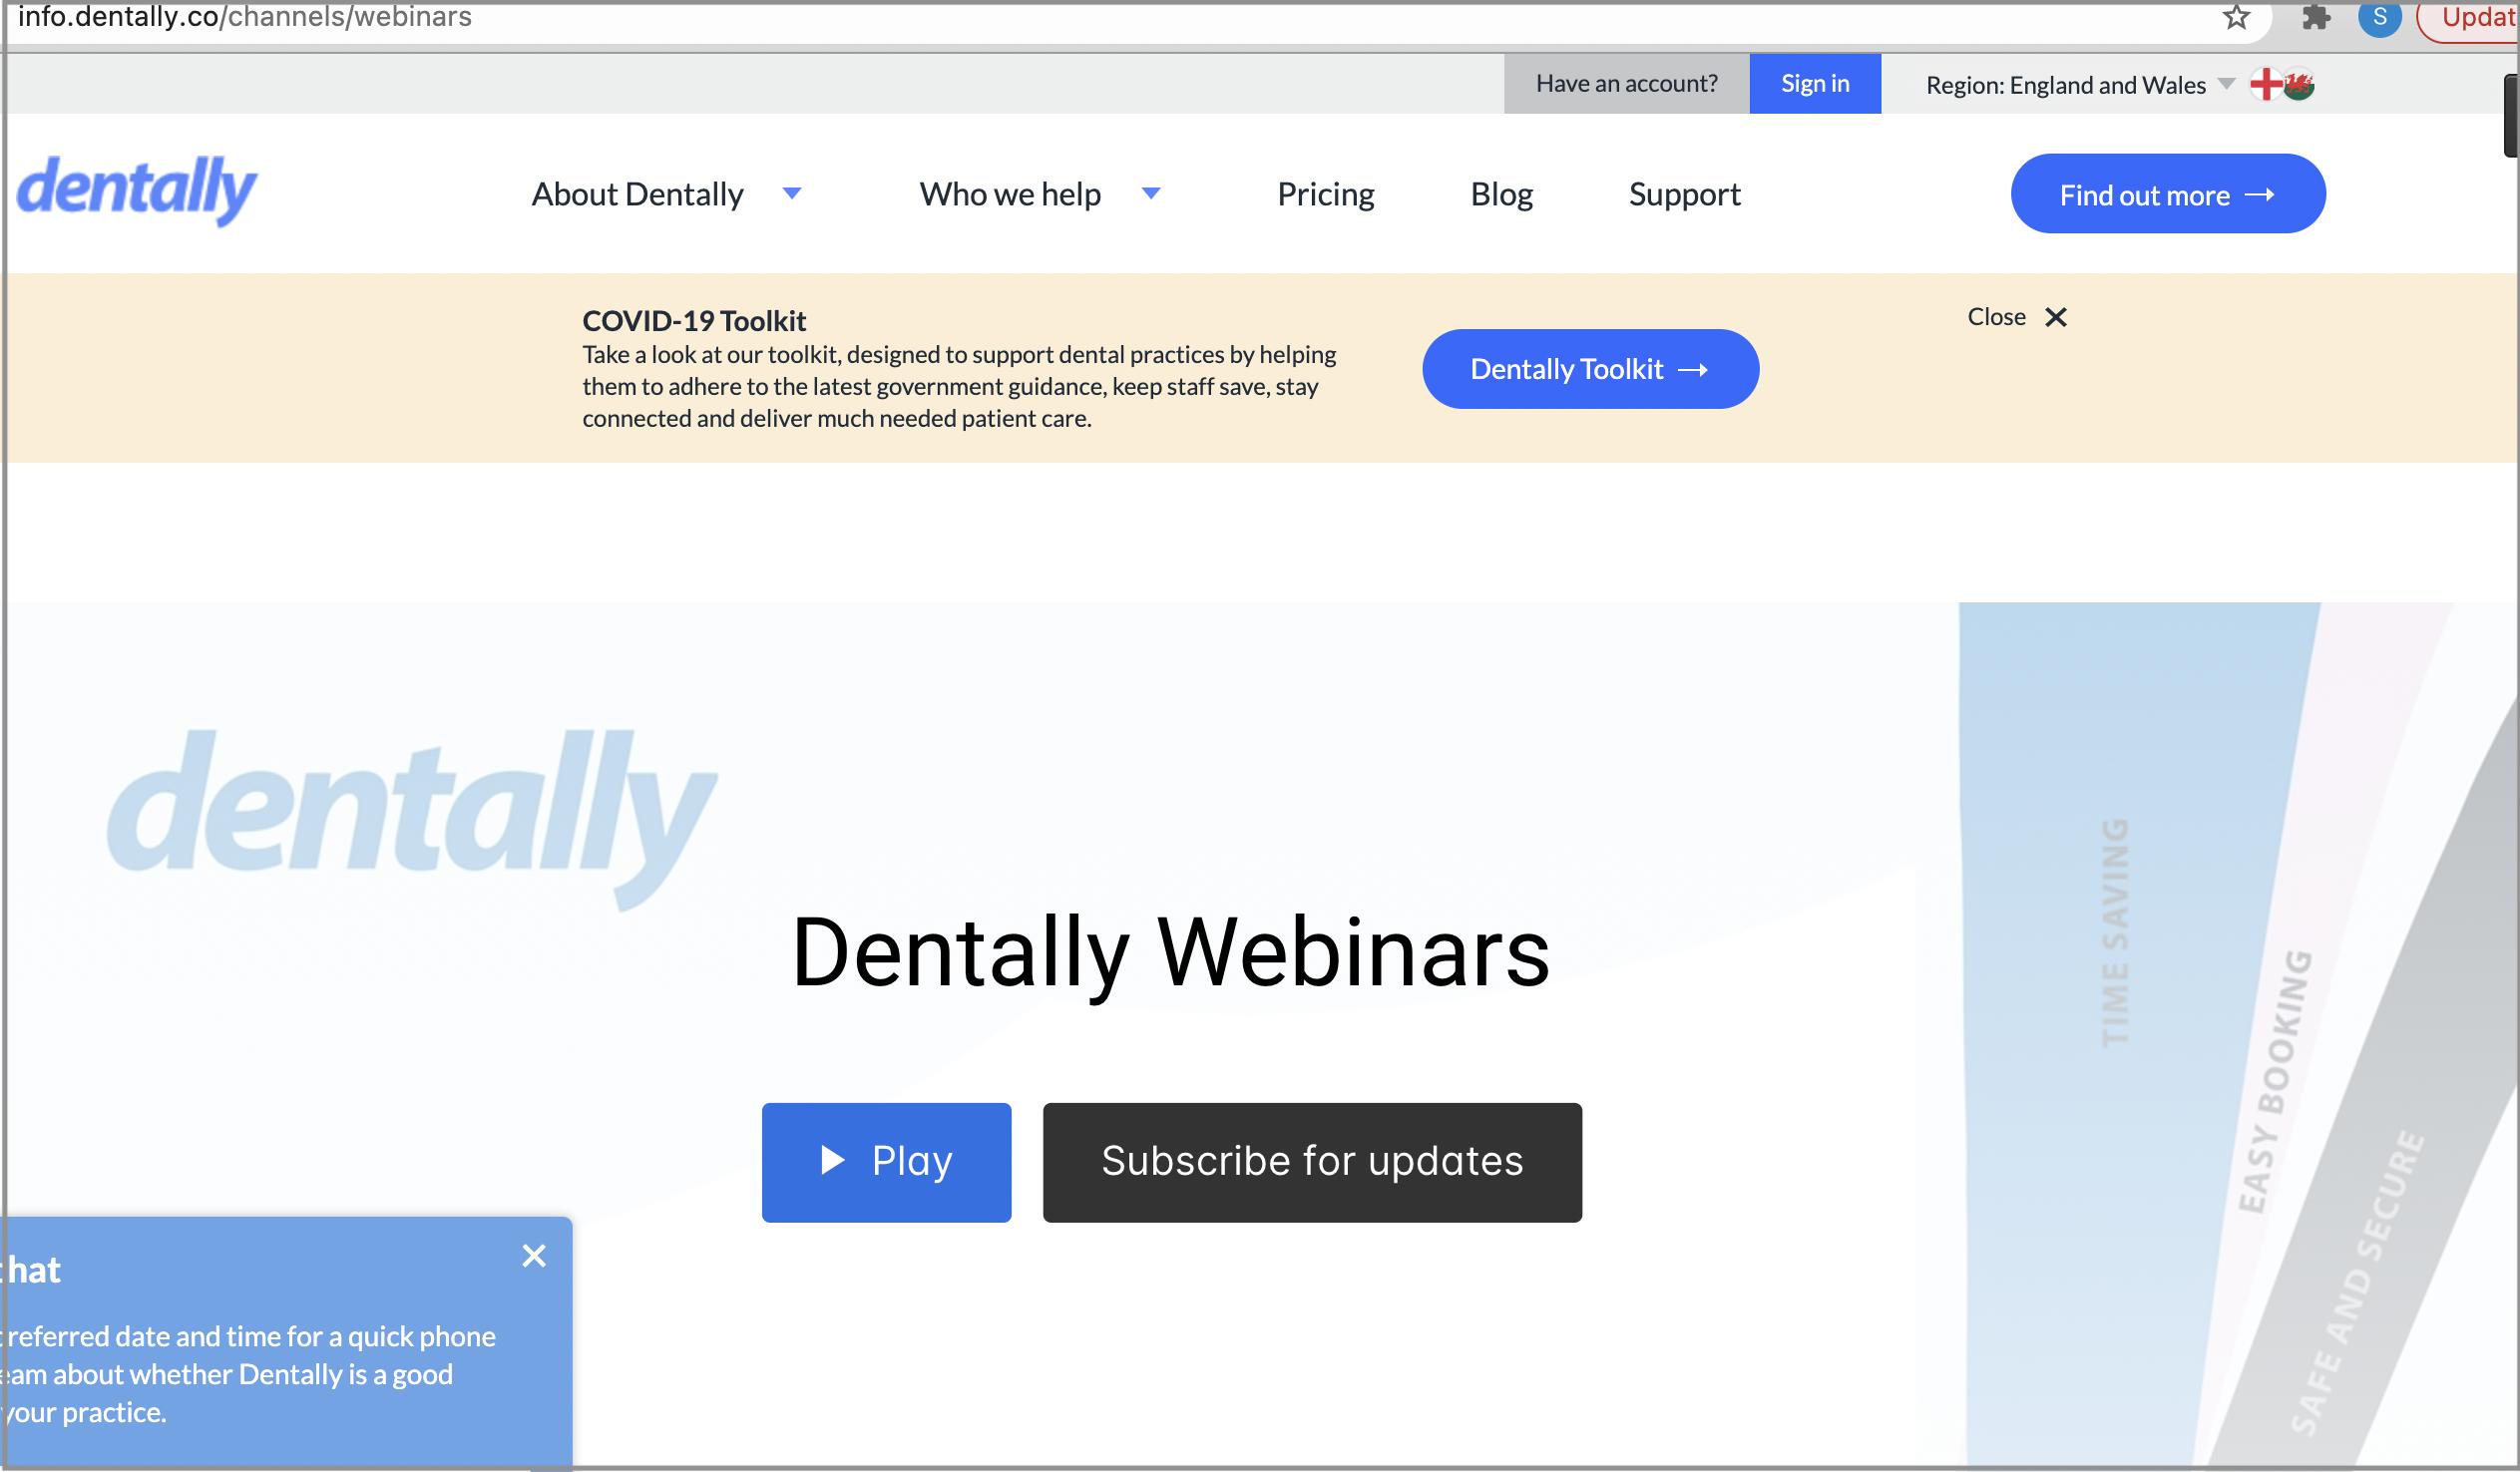 webinars in dentally